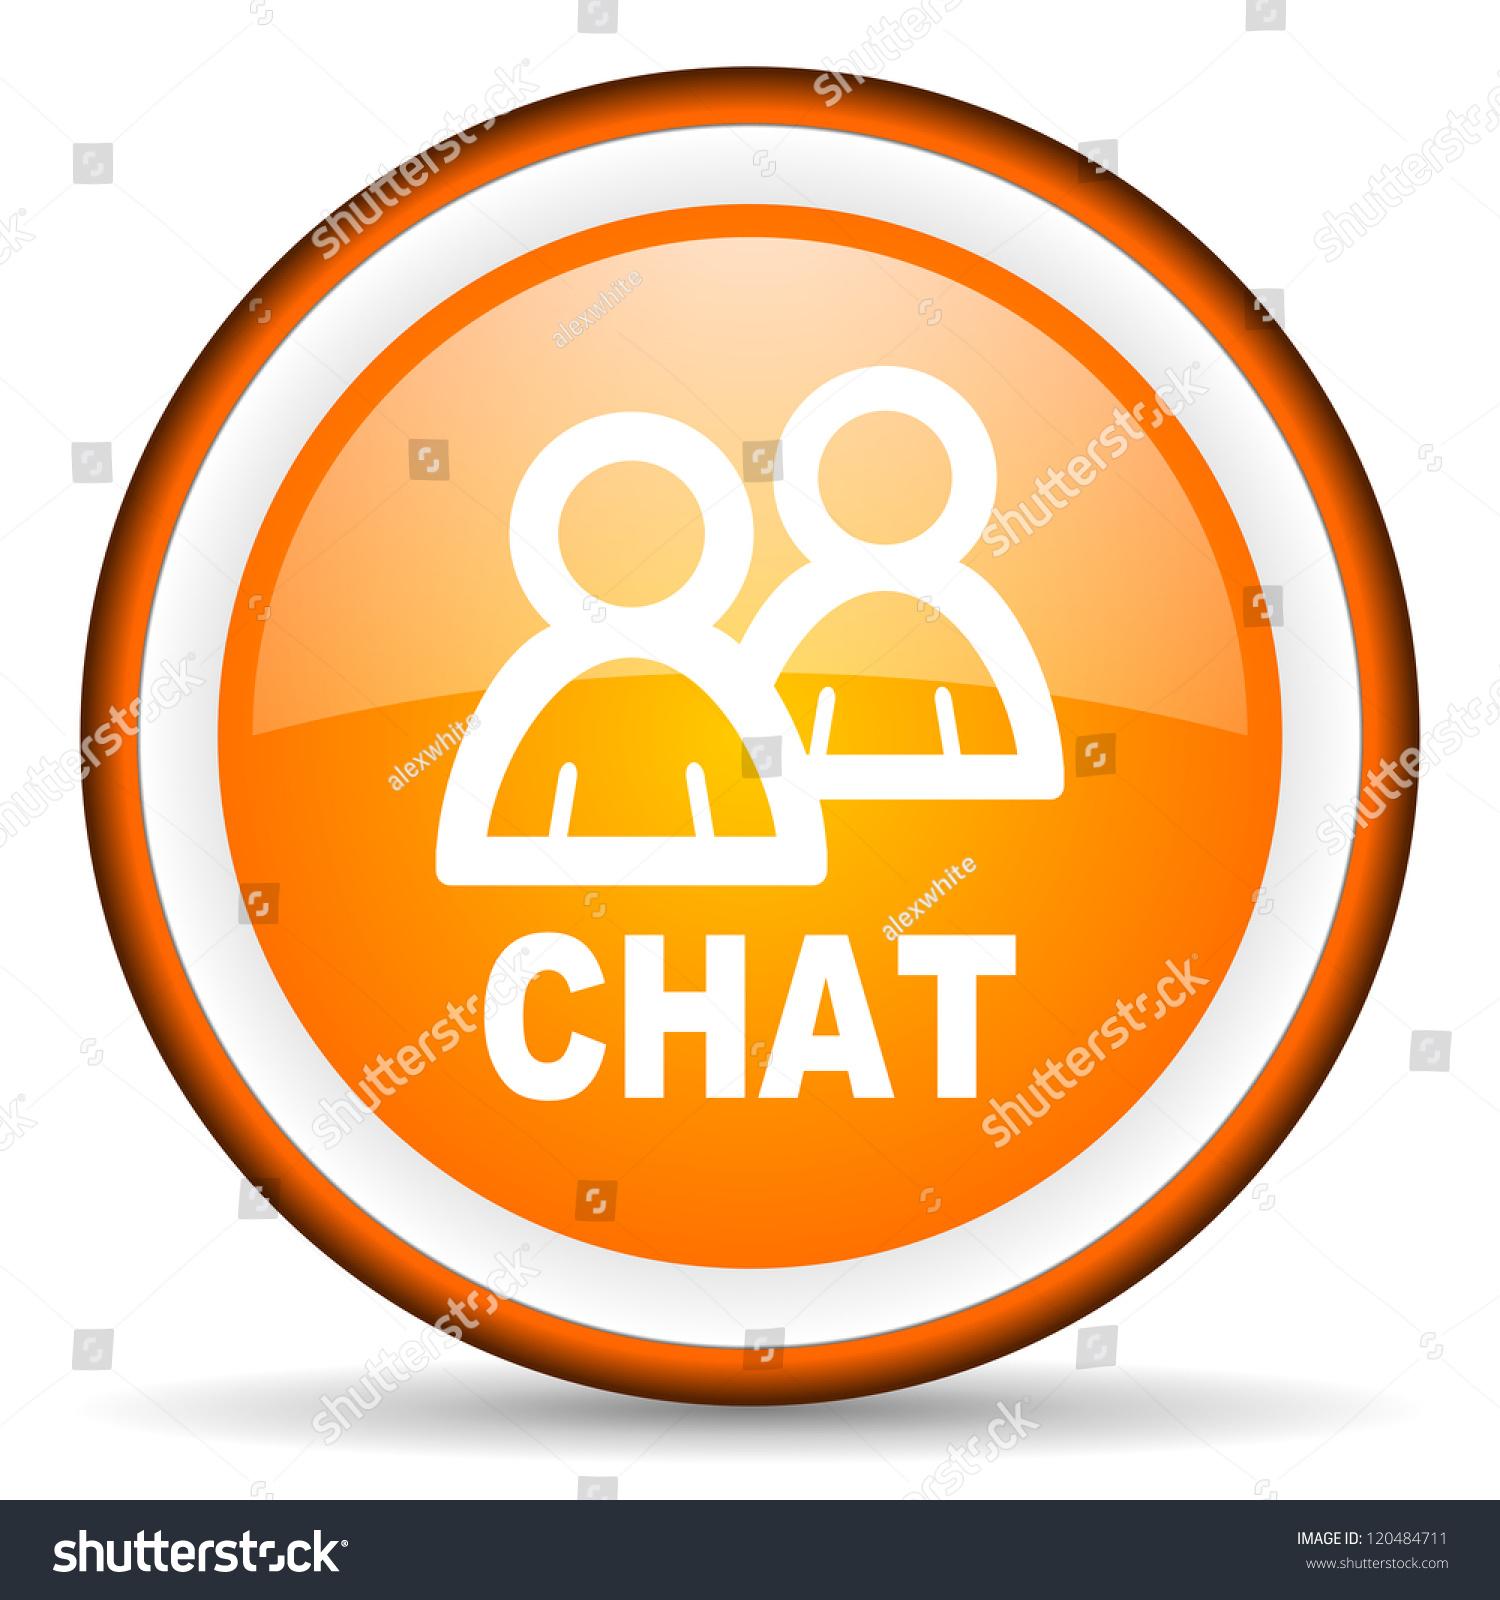 Chat orange glossy circle icon on white background stock - Chat orange ...